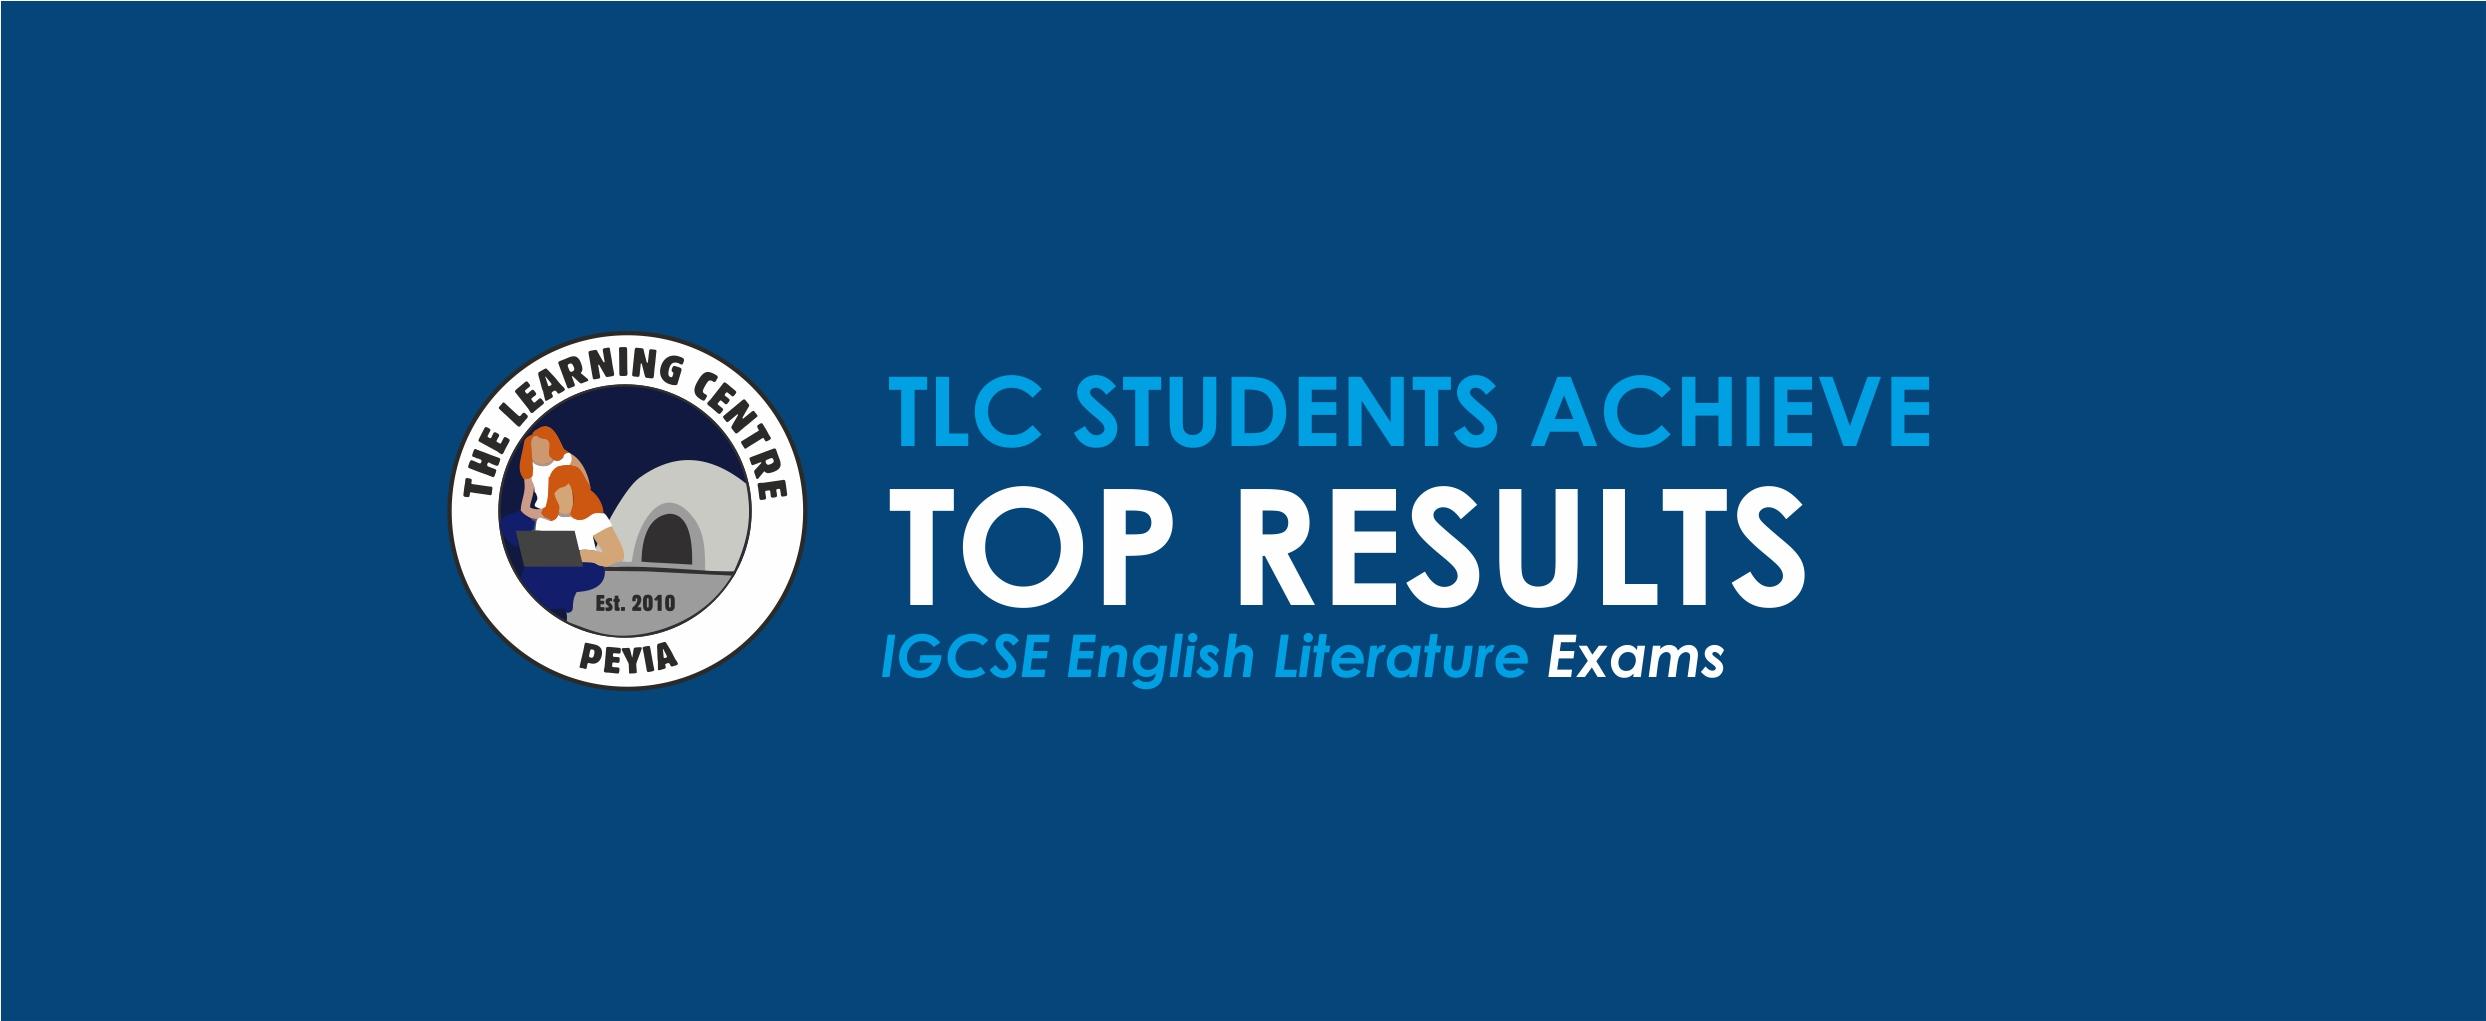 TLC Students Achieve Top Results IGCSE English Literature